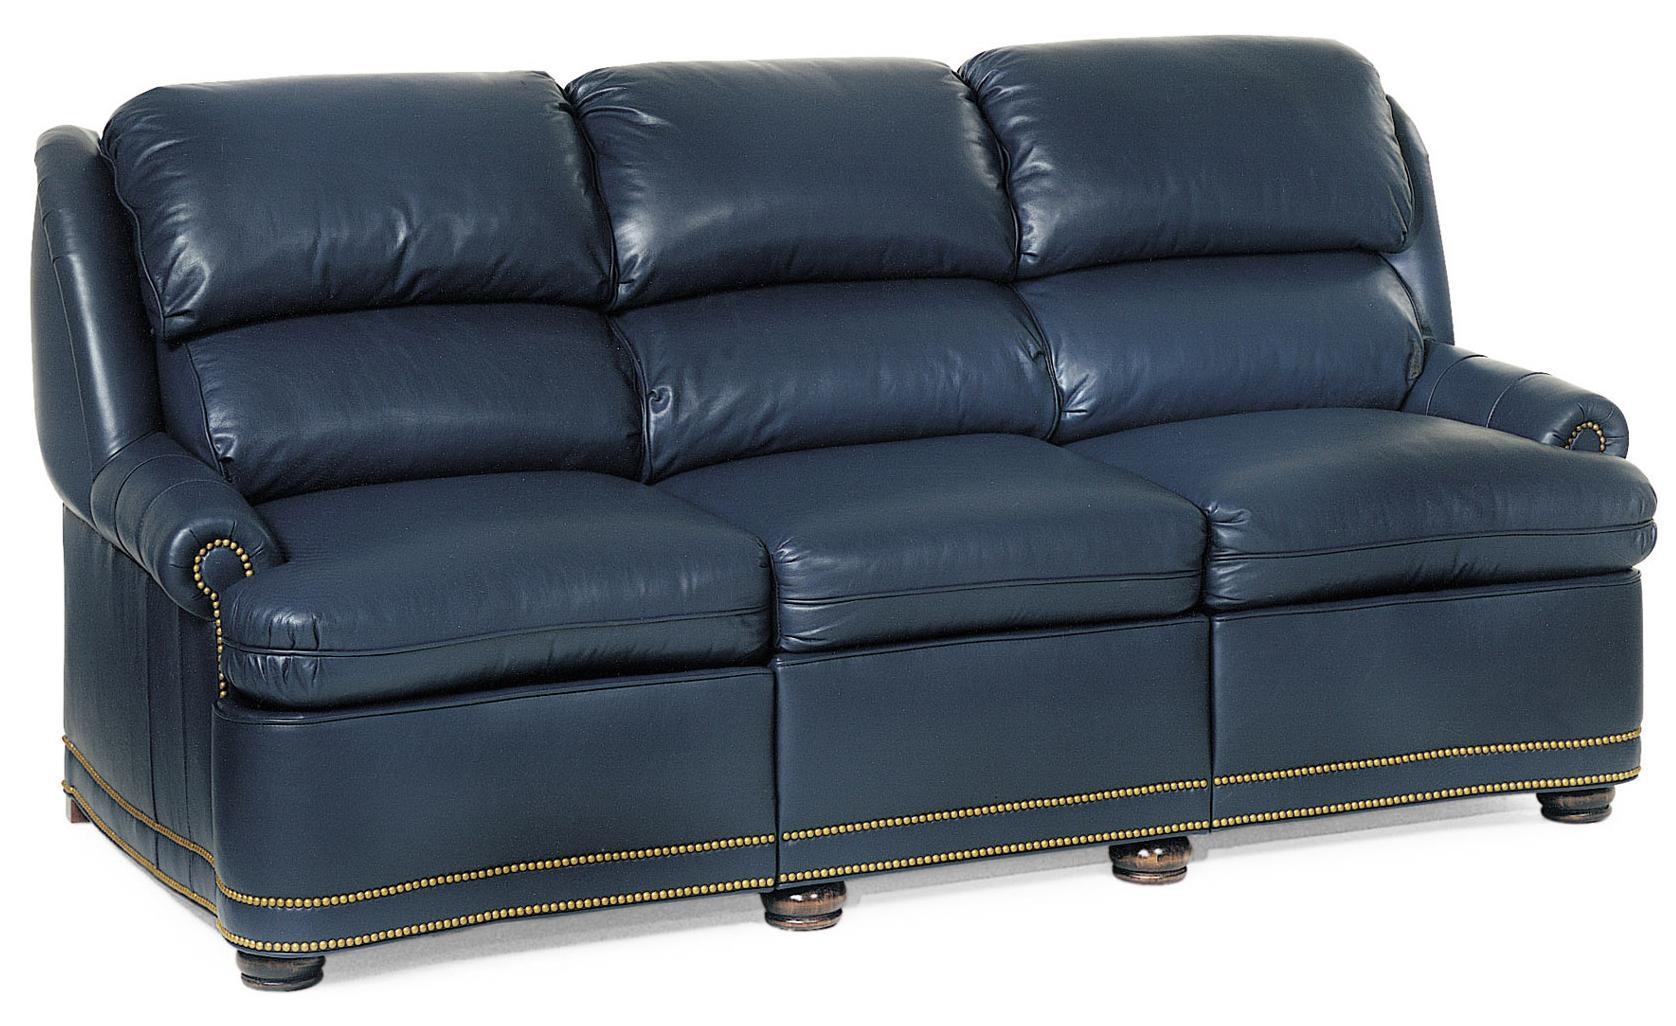 Hancock U0026 Moore Austin Traditional Full Recline Sofa With Nailhead Trim